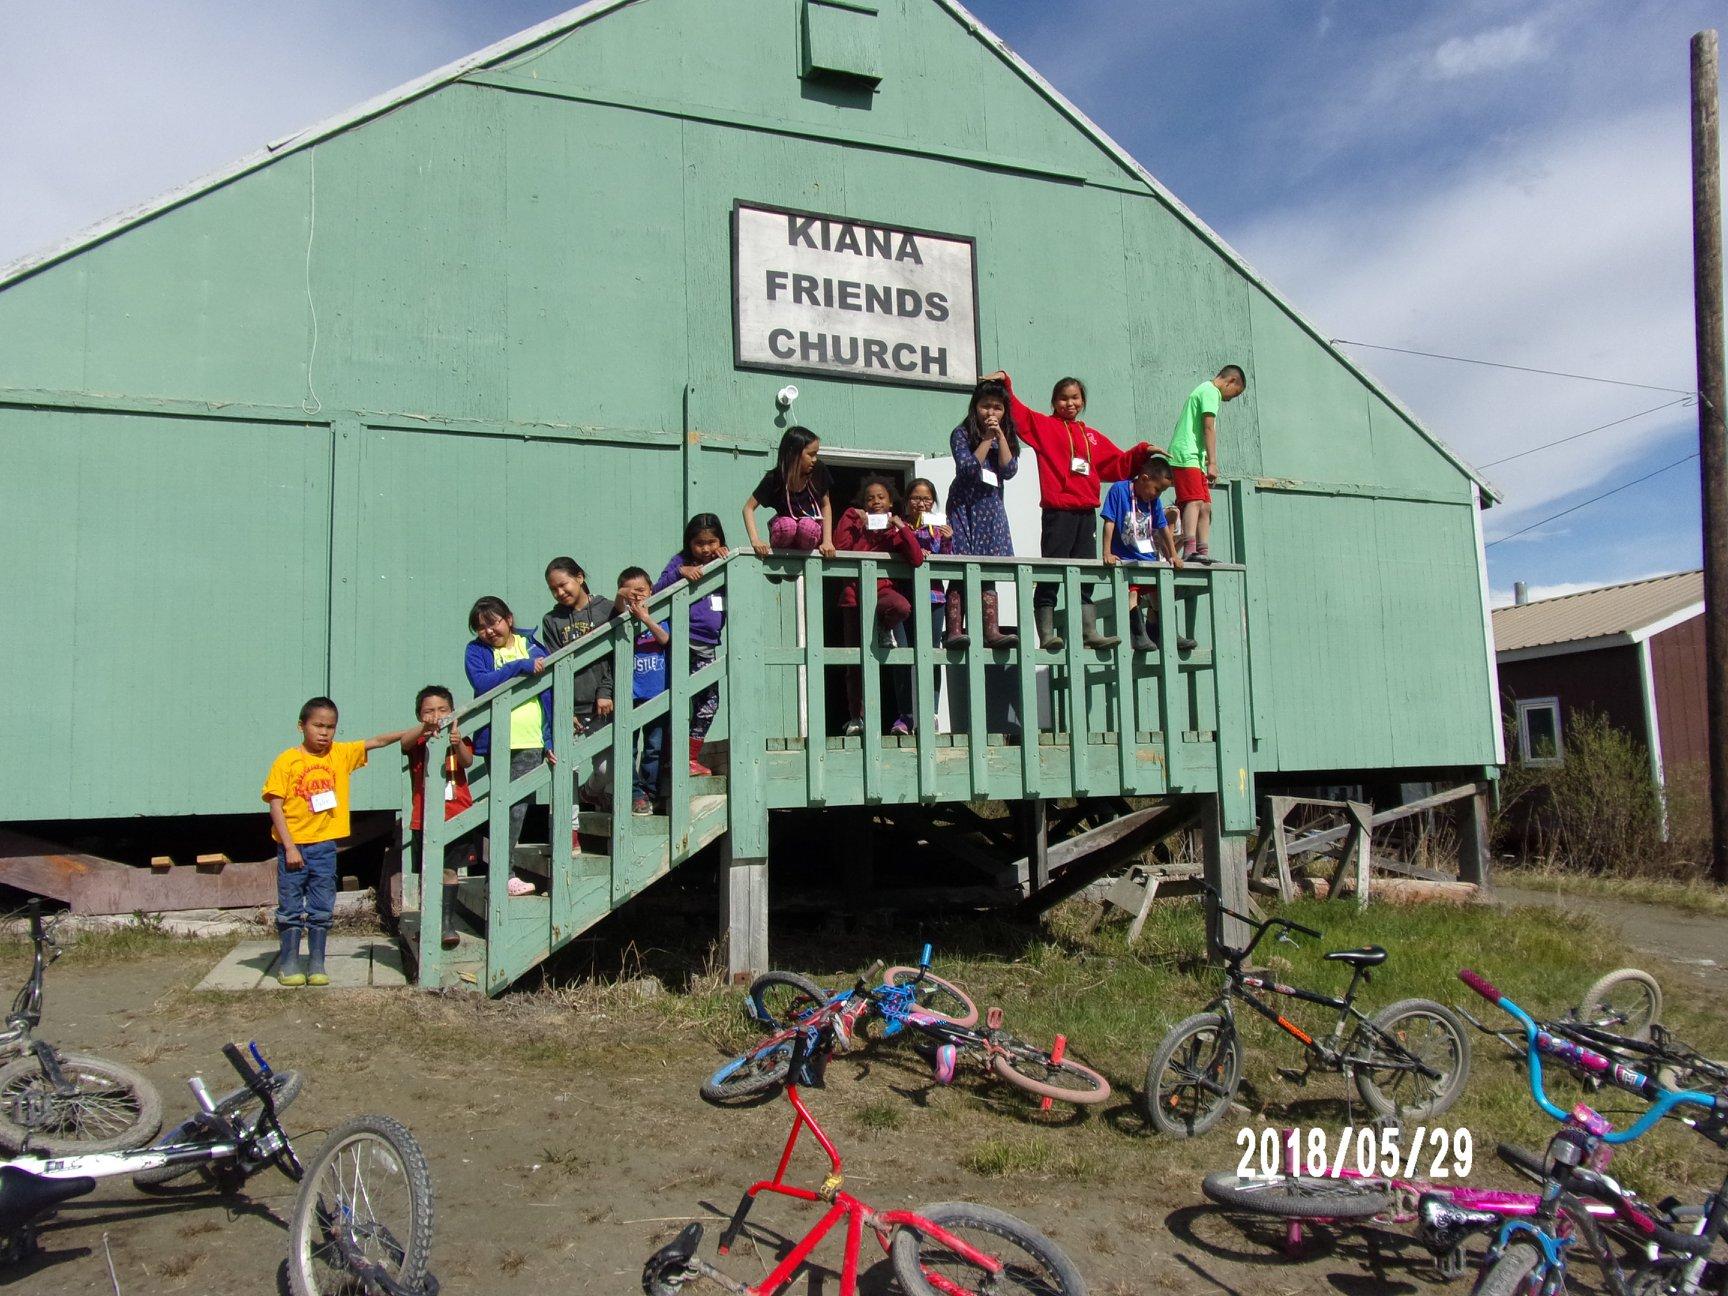 Kids lined up at the Kiana Friends Church alaska lutheran indian ministries native